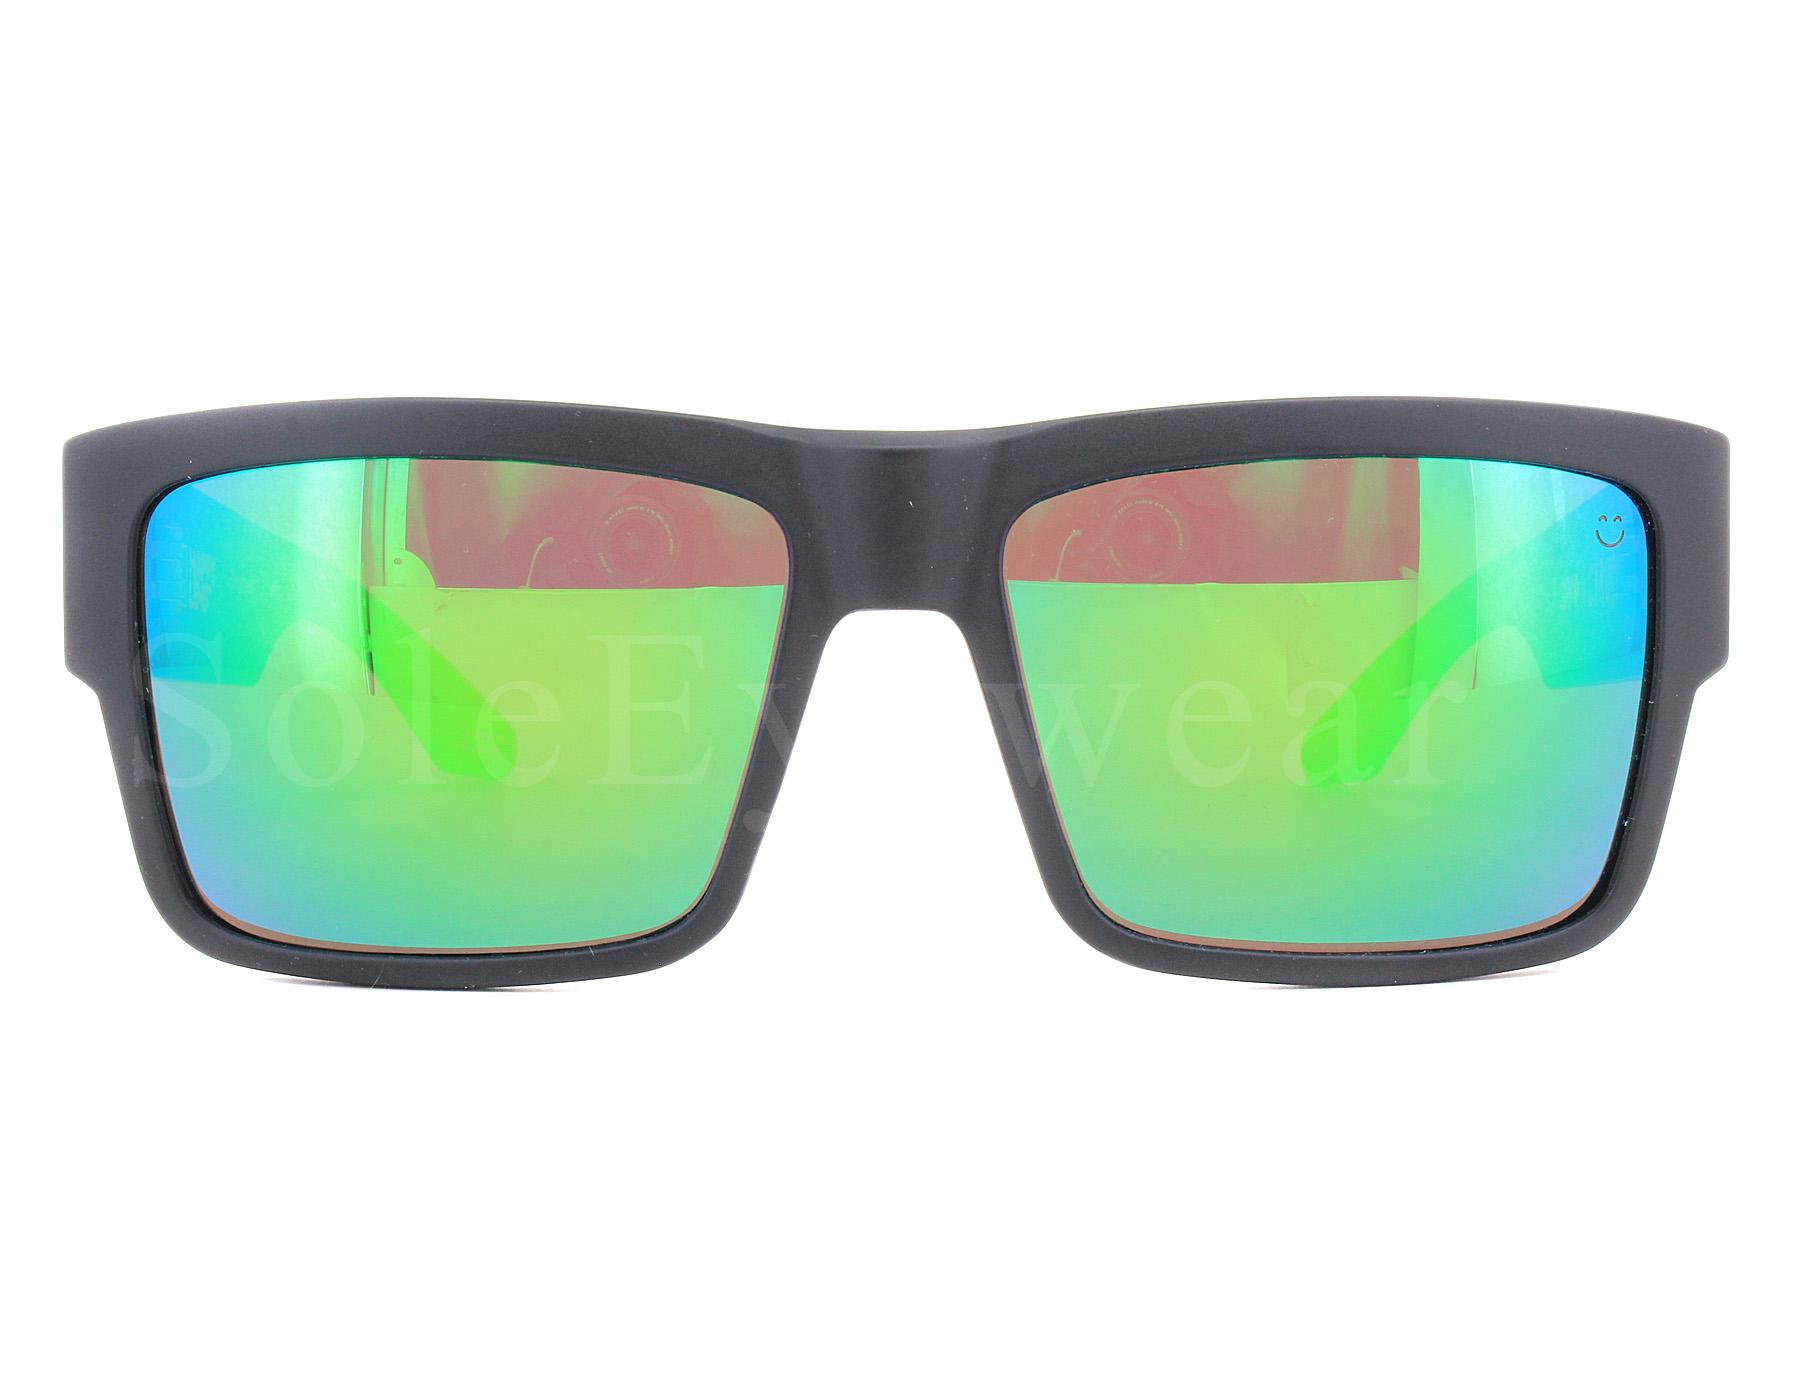 1eeb5195c9 Spy Cyrus Sunglasses Ebay